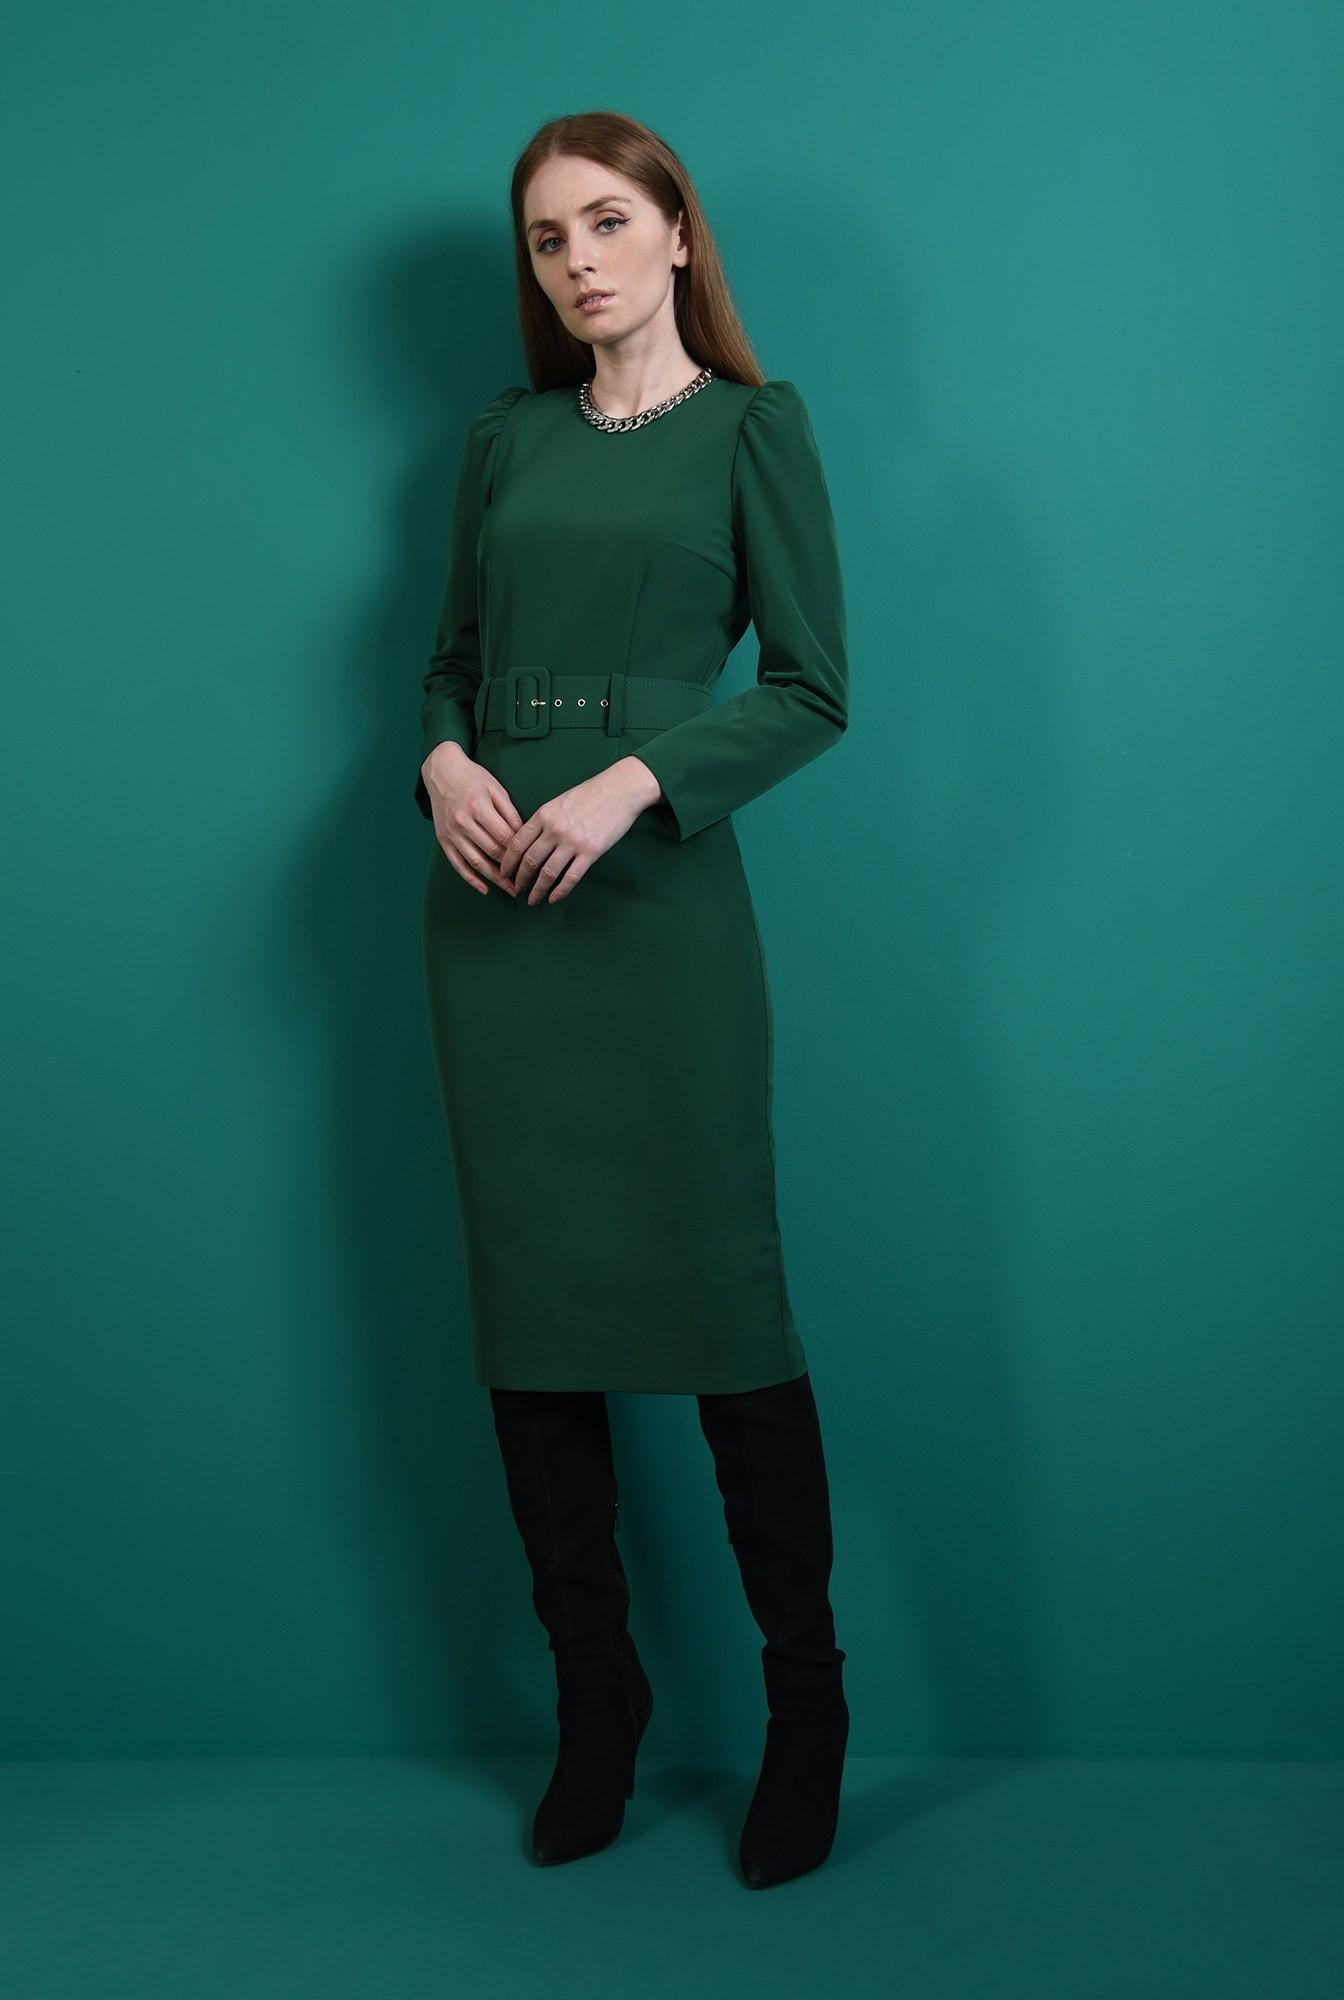 0 - rochie verde, office, cu maneca lunga